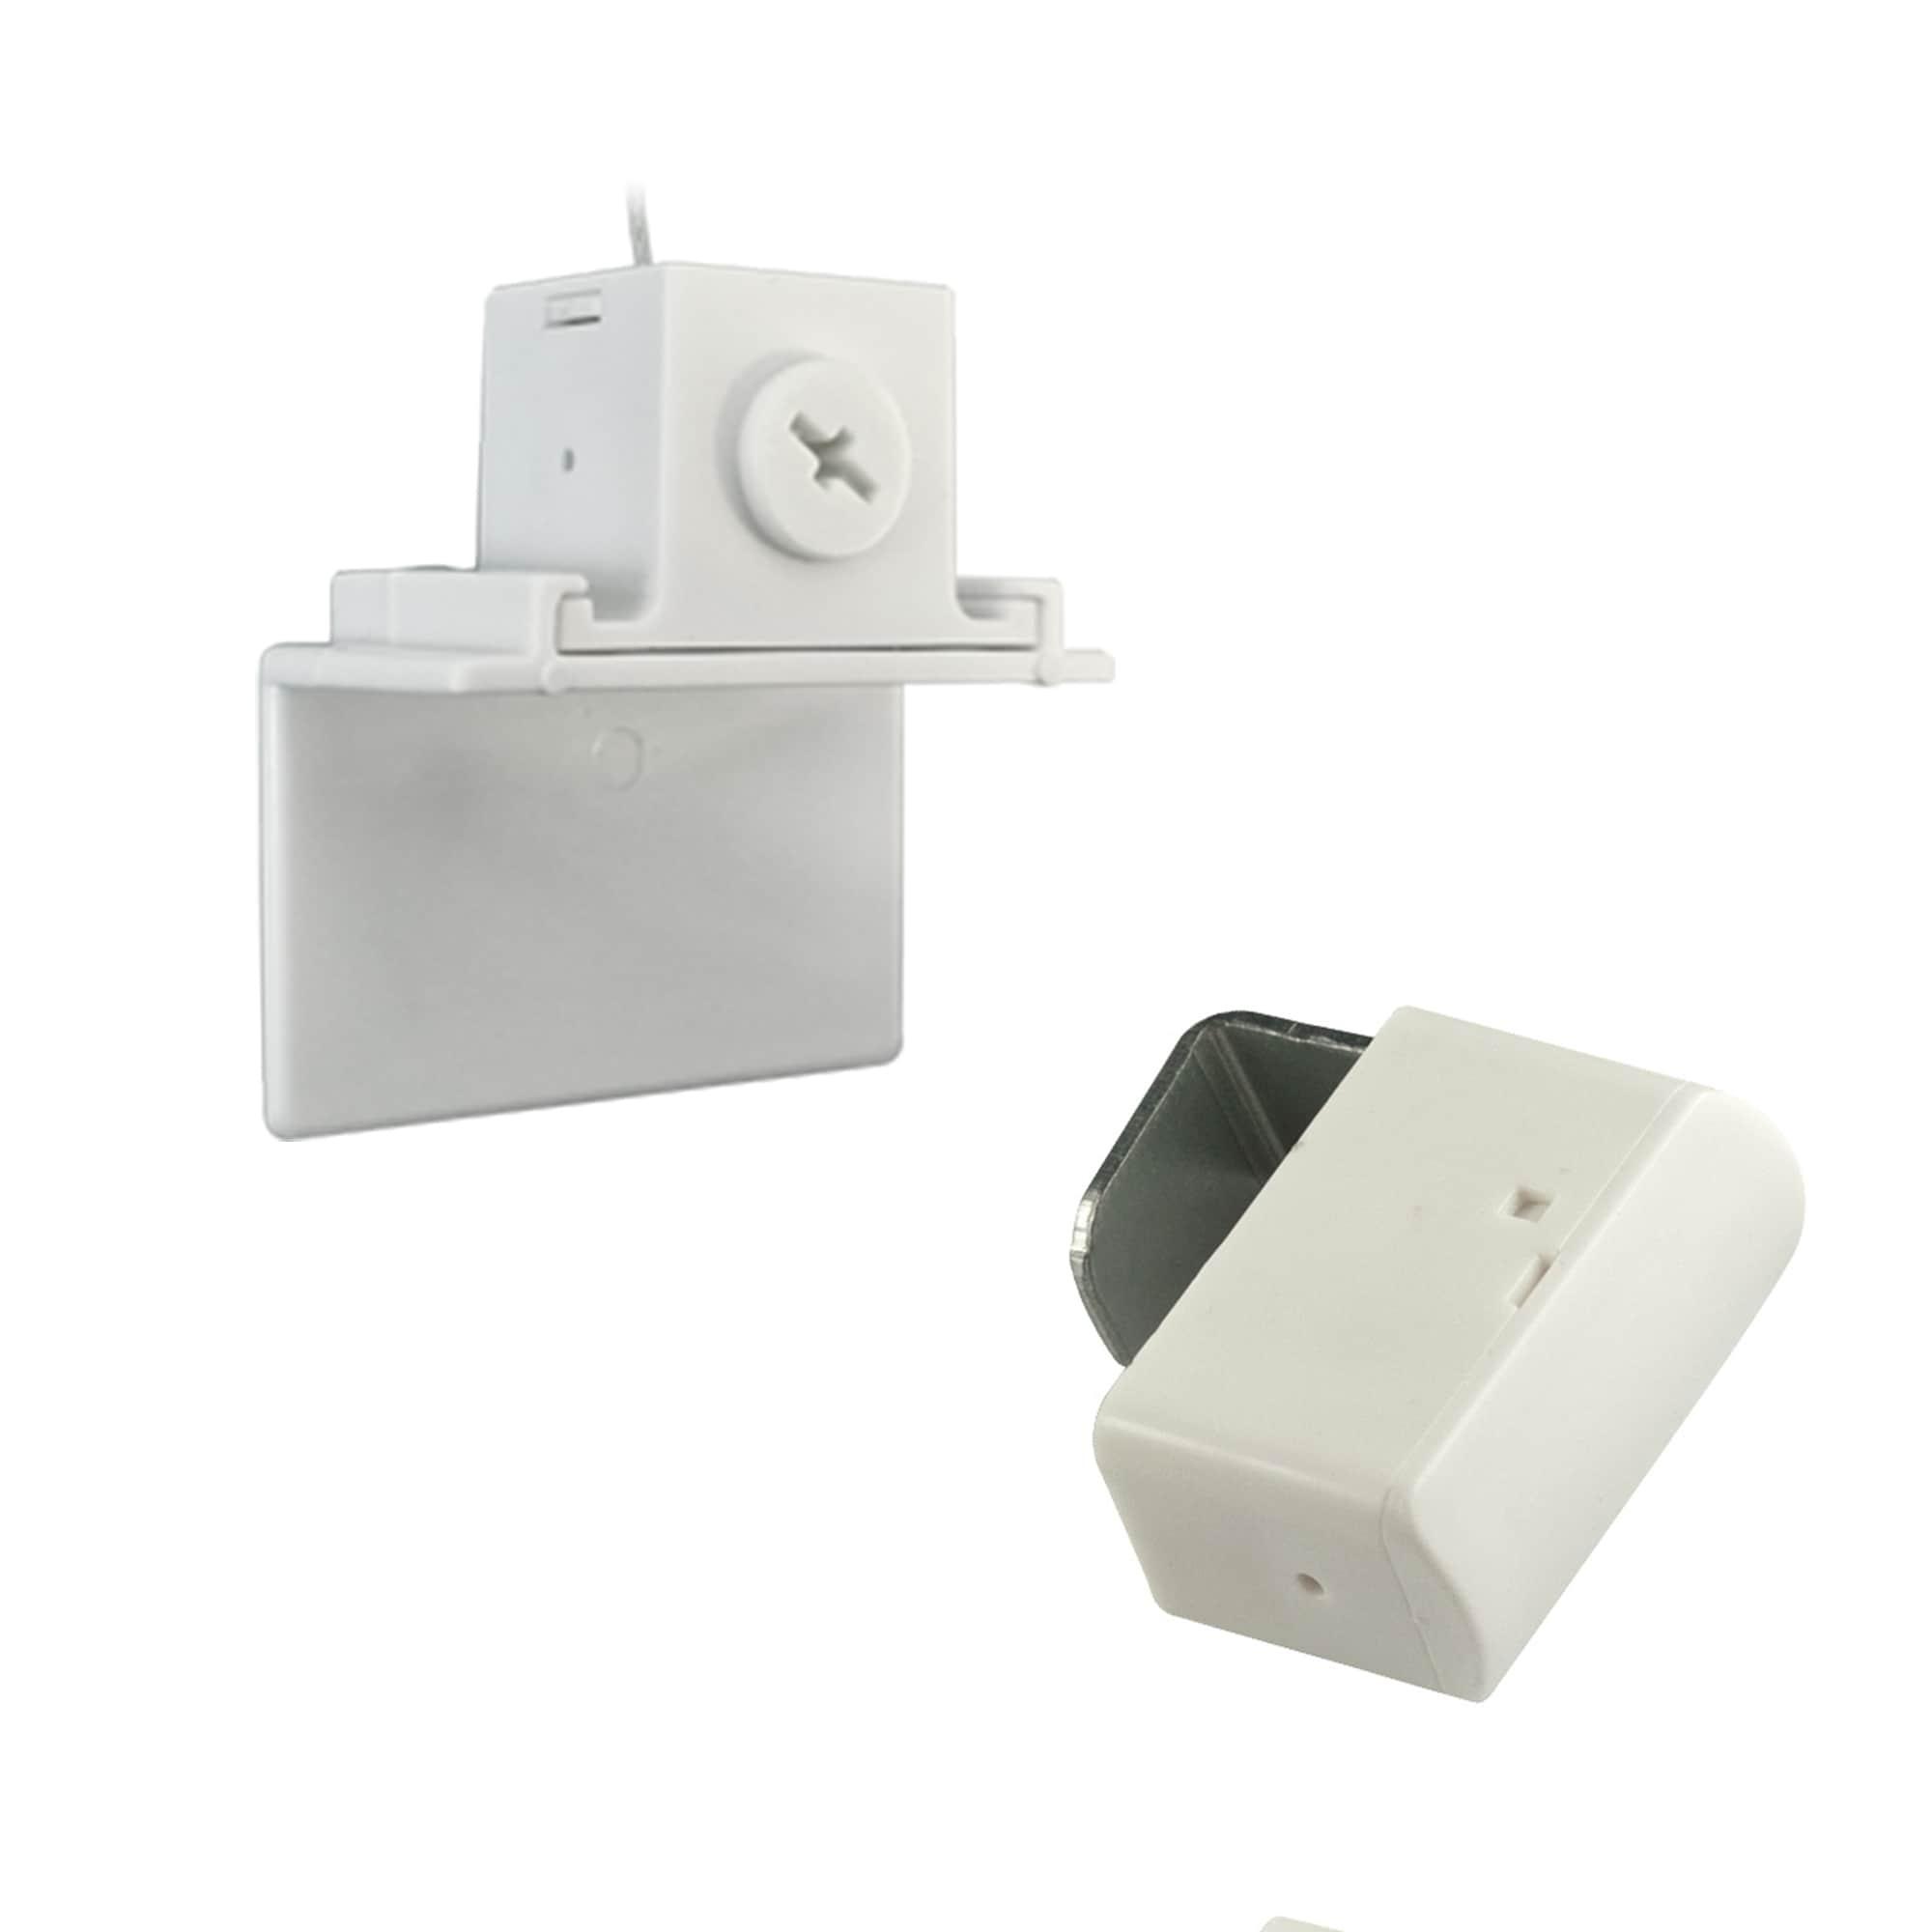 ersatzteilsets f r easyfix plissees victoria m plissee klemmfix plisseejalousie ebay. Black Bedroom Furniture Sets. Home Design Ideas